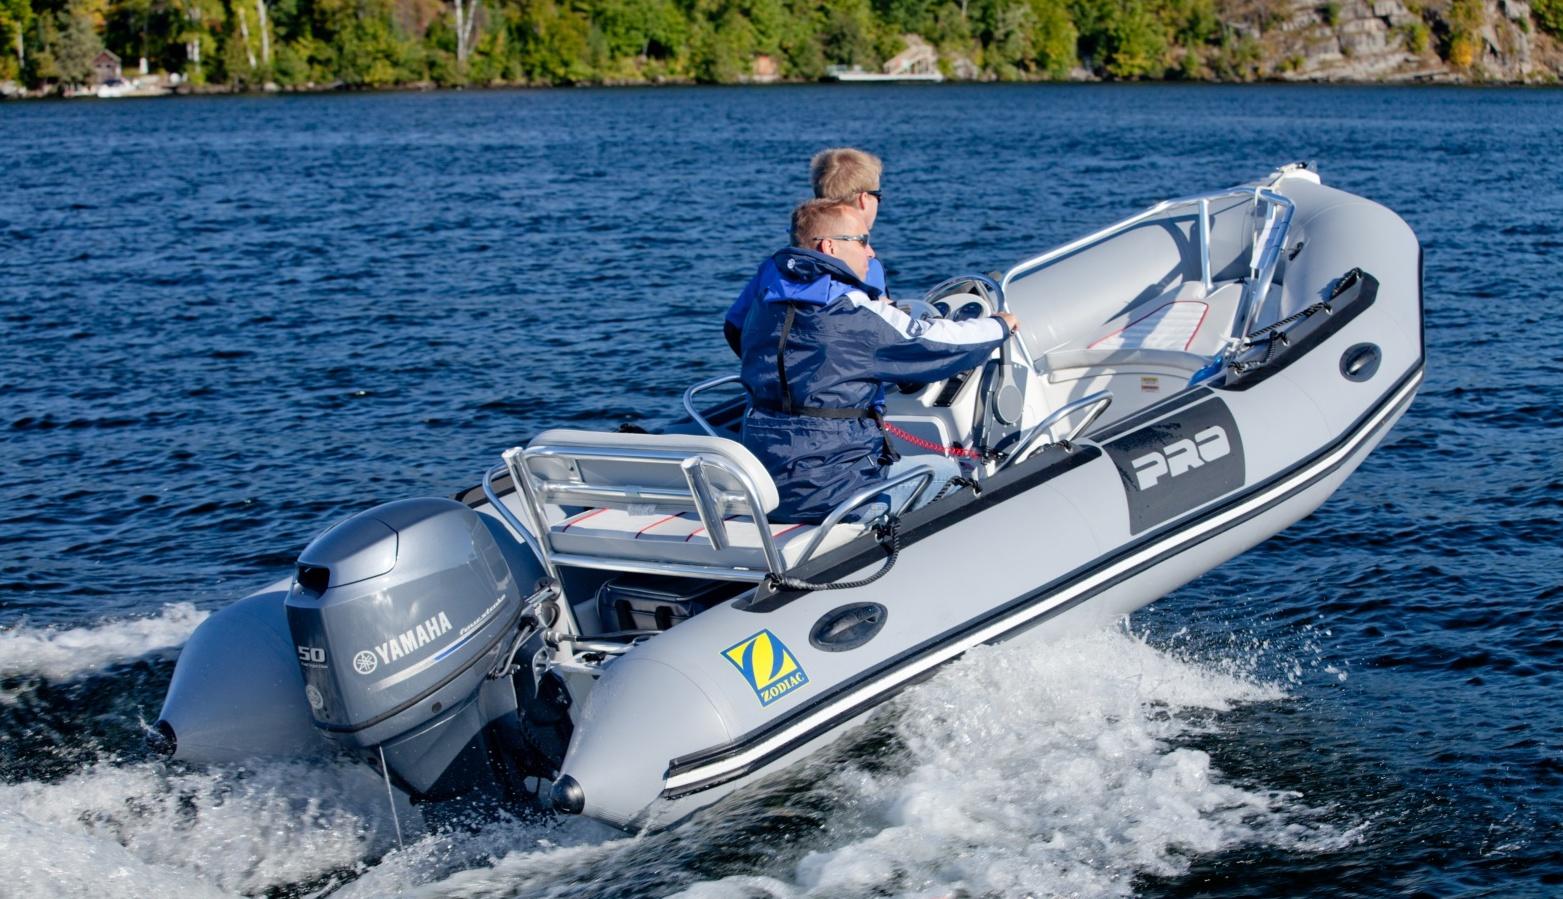 yamaha 50 hp outboard service manual